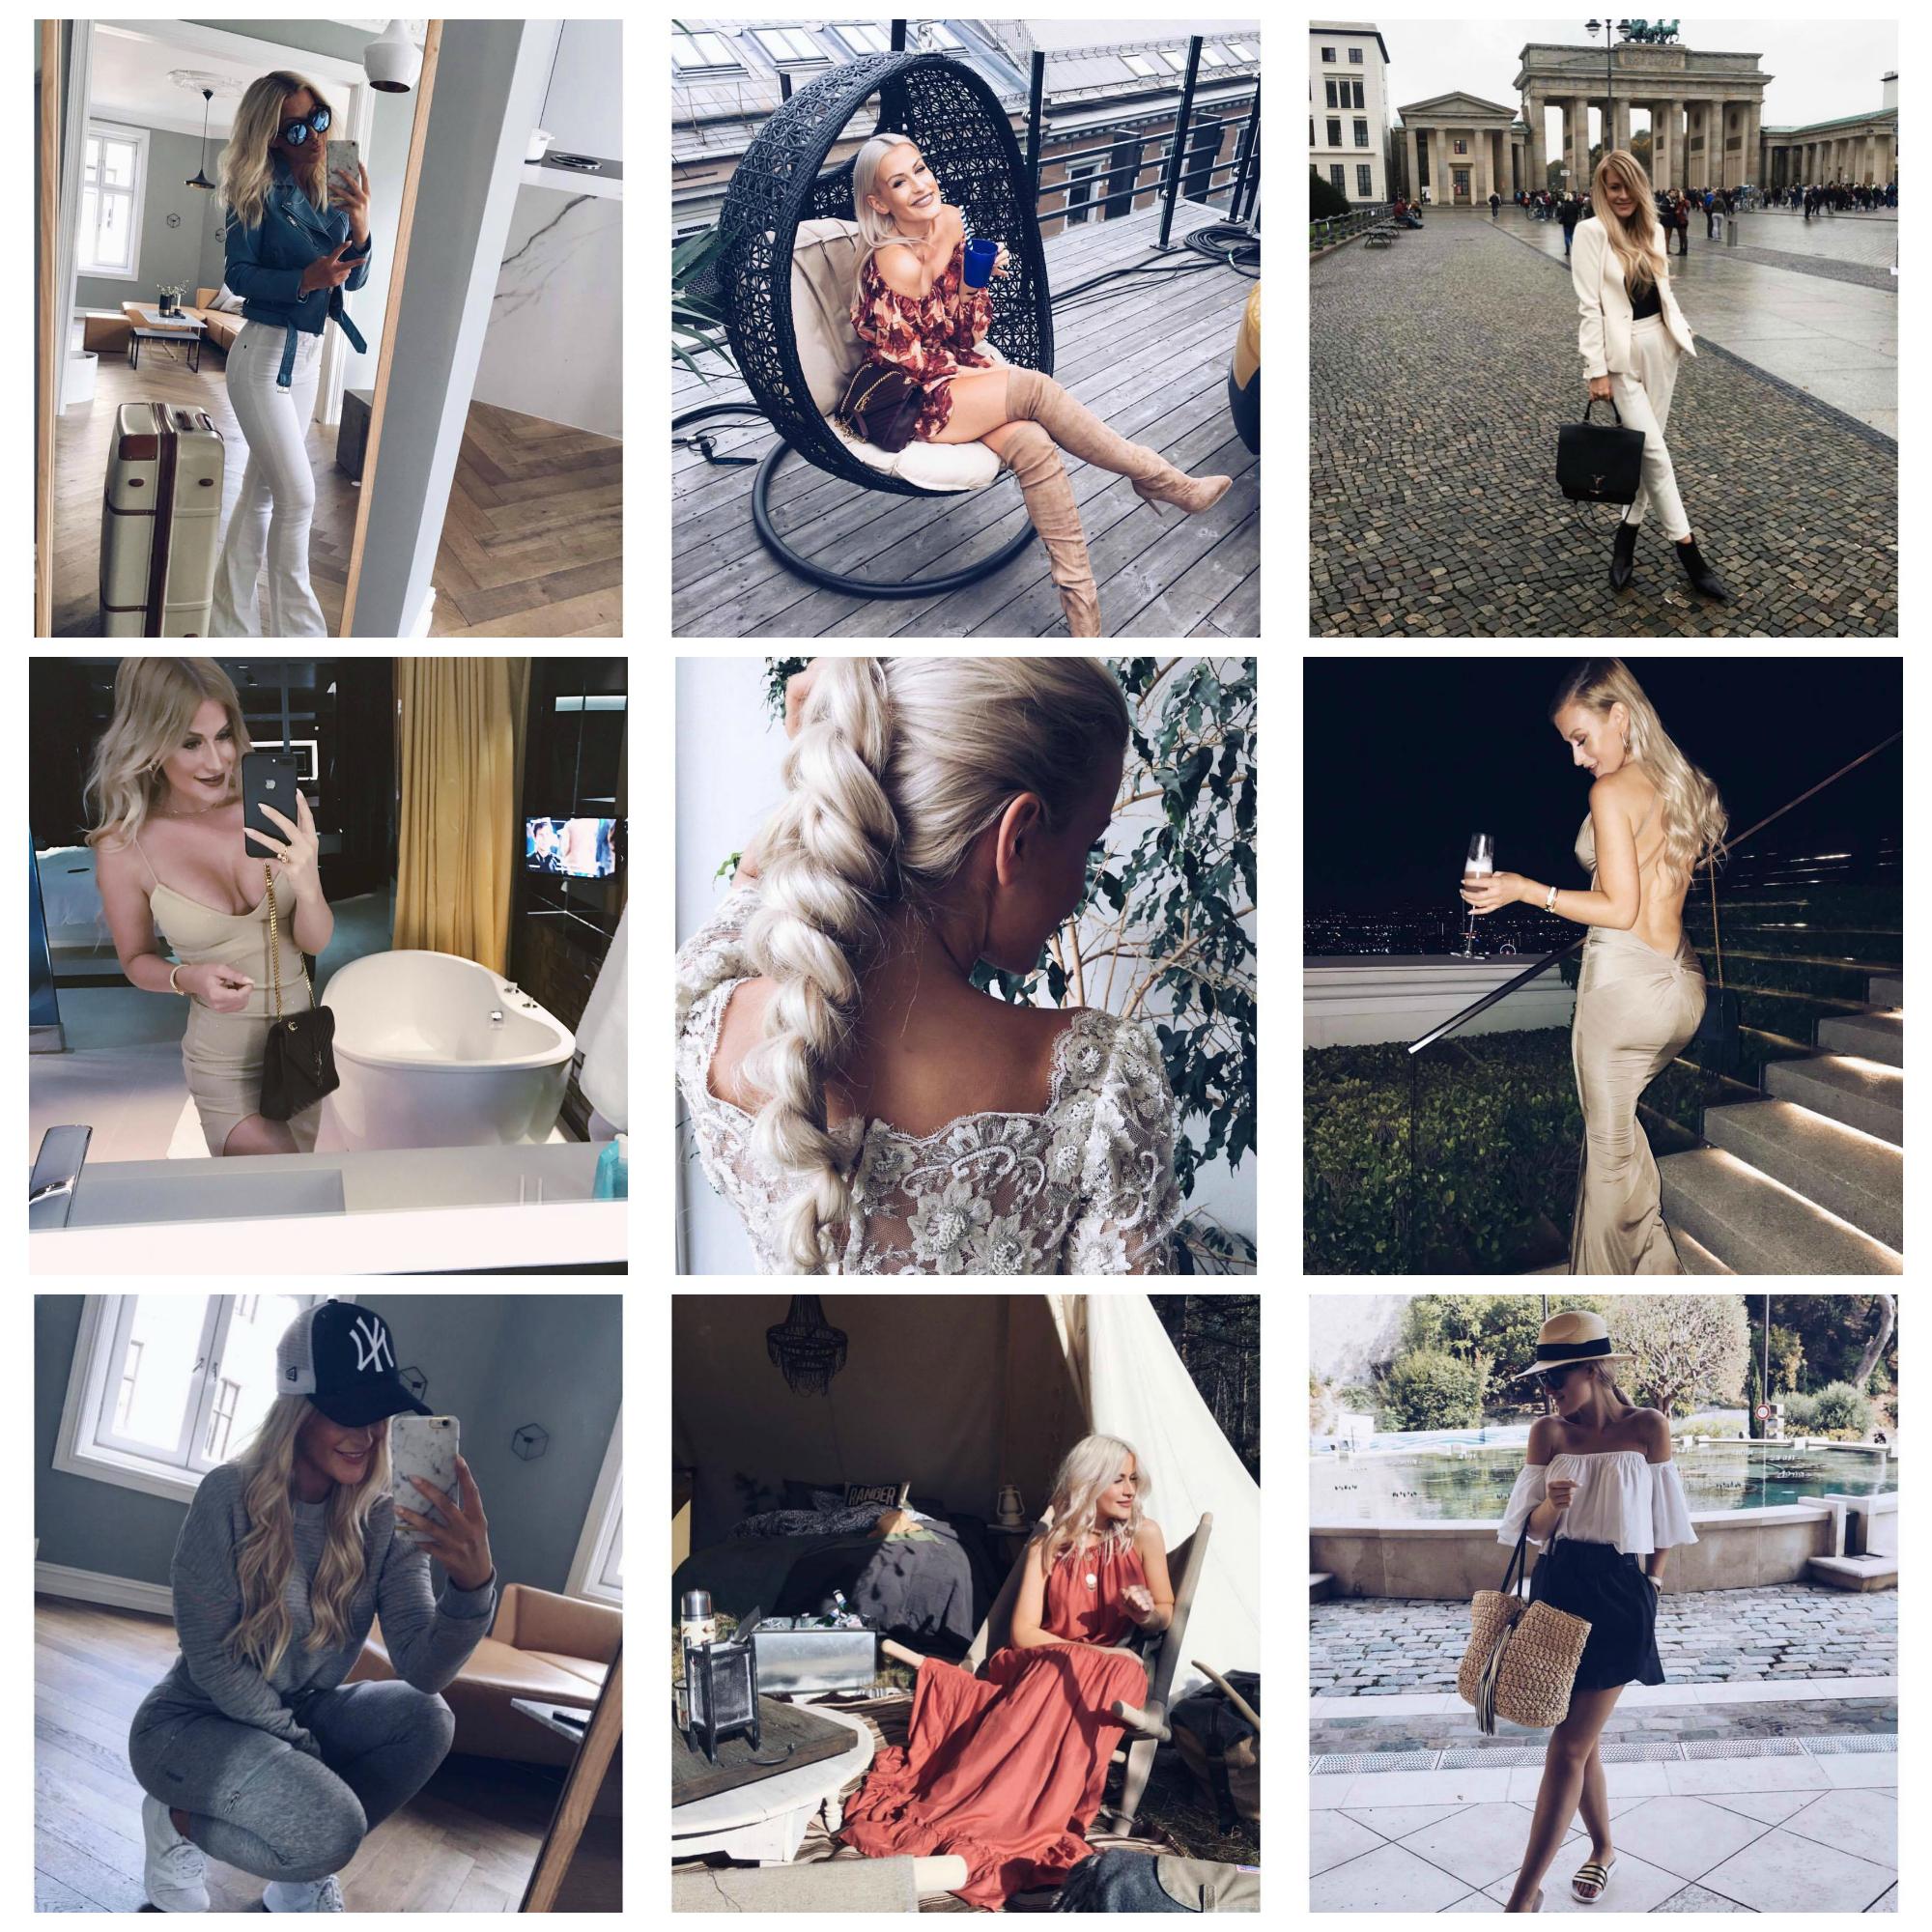 PicMonkey Collage-29